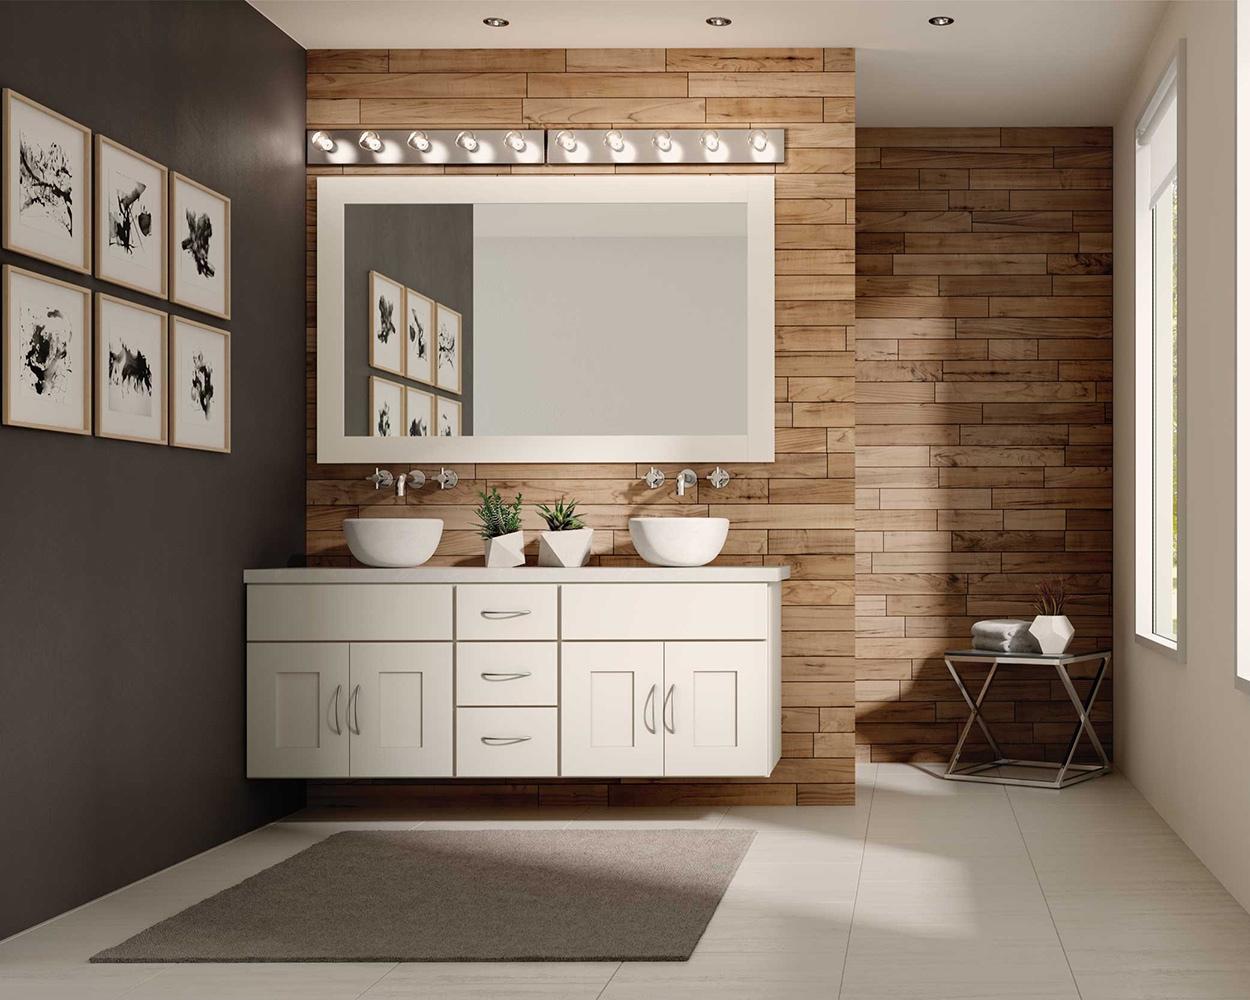 House of Kitchens - bathroom_Modern.jpg